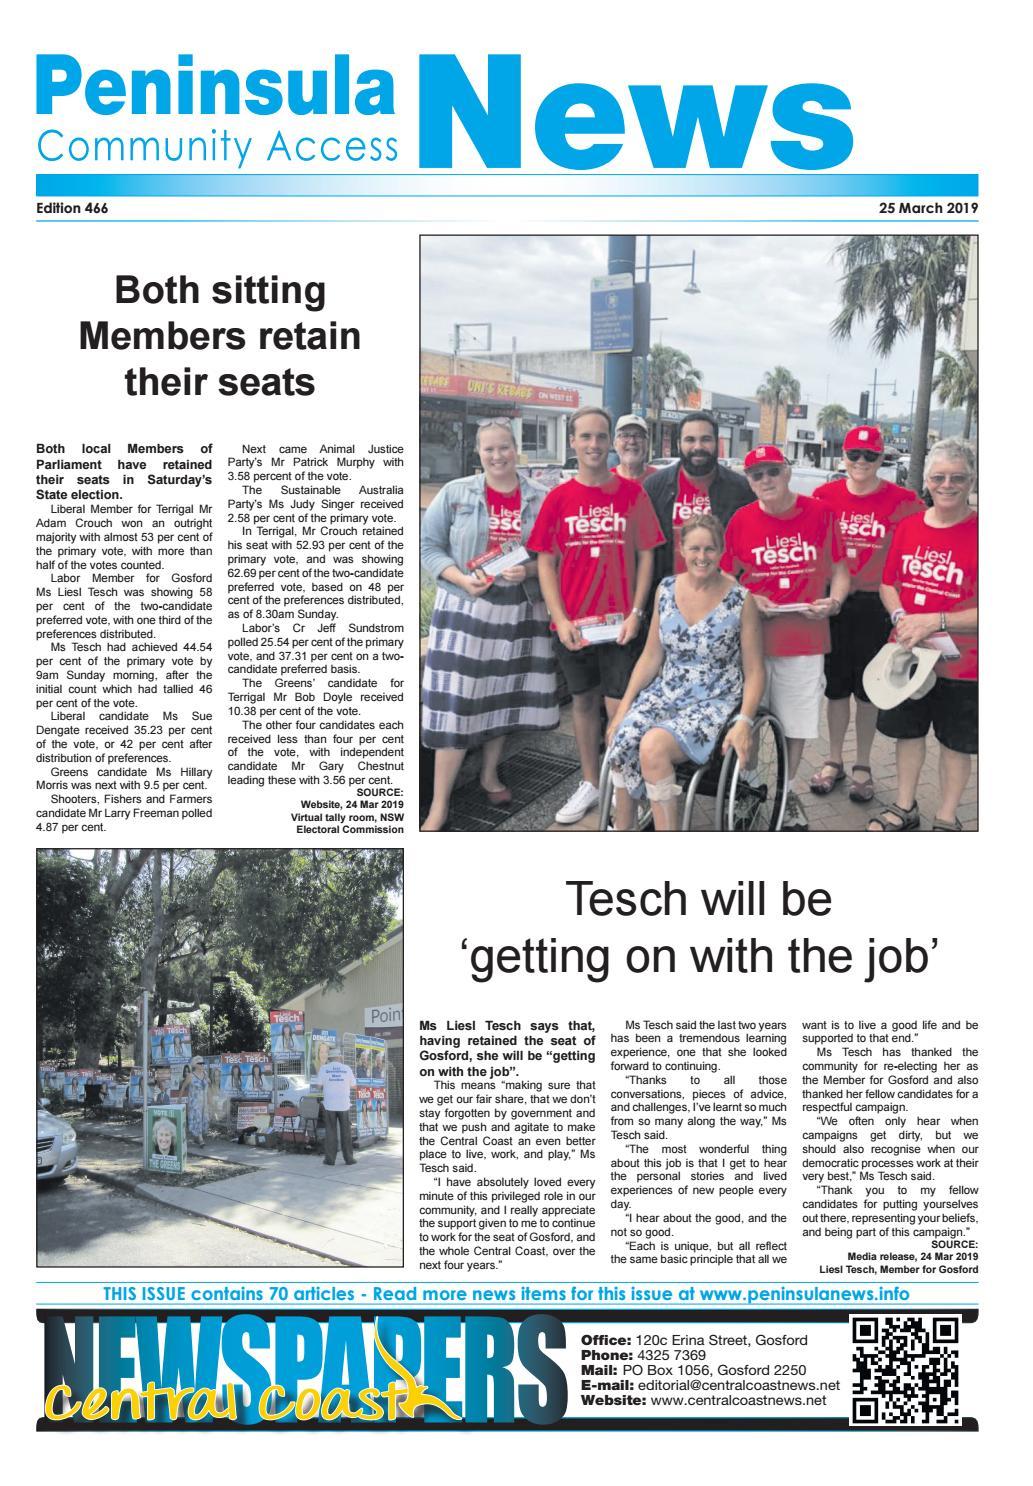 Peninsula News 466 by Mark Snell - issuu